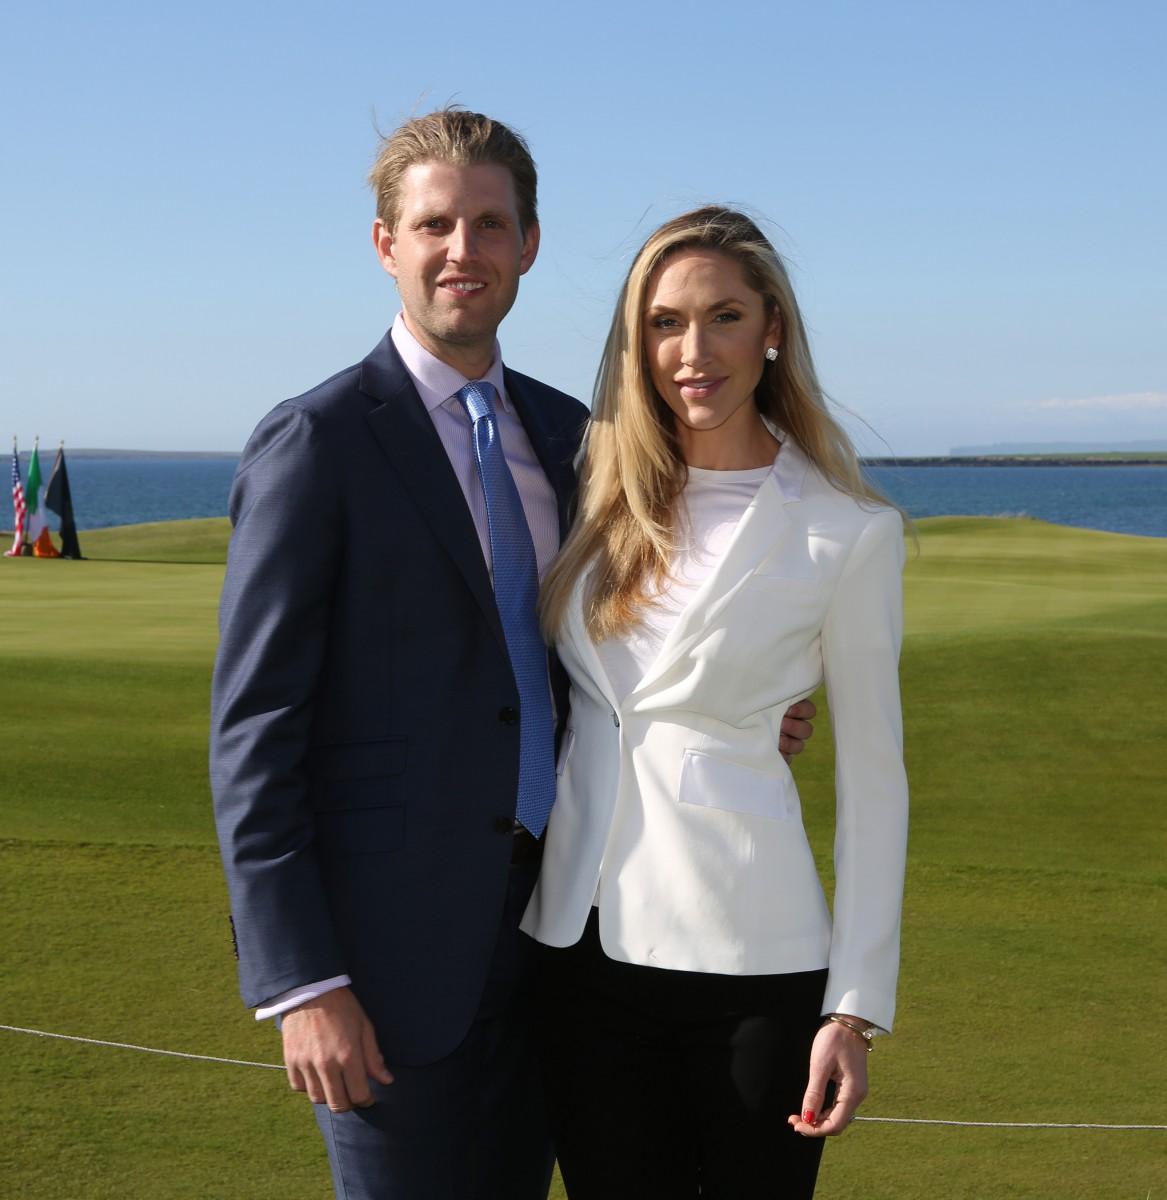 Eric and Lara Trump.Photographs by Liam Burke/Press 22